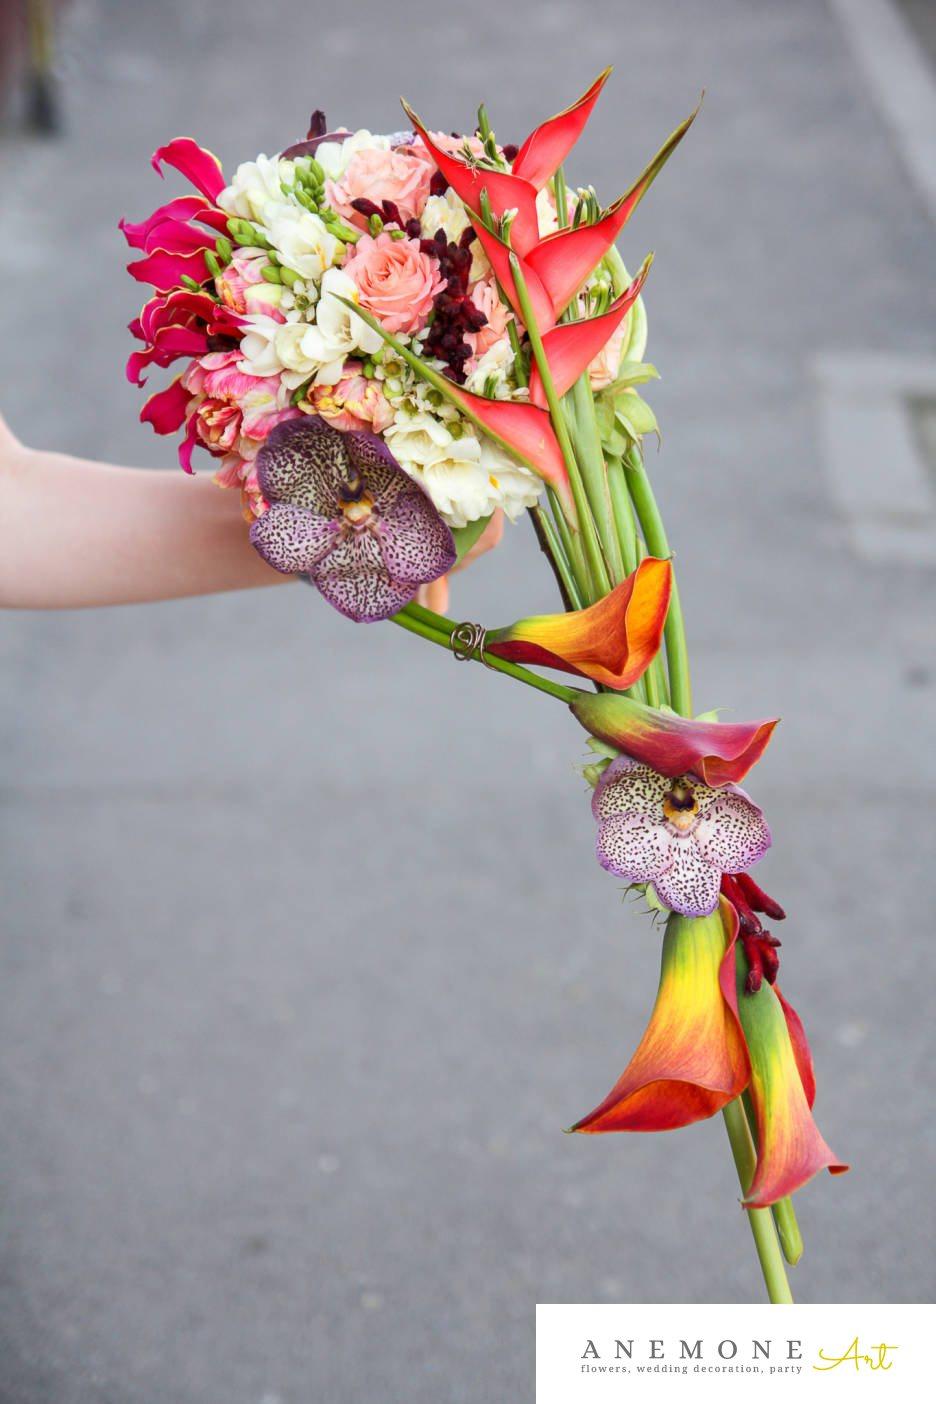 Poza, foto cu Flori de nunta buchet mireasa, calla, curgator, frezii, multicolor, orhidee, ornitogallum, trandafiri in Arad, Timisoara, Oradea (wedding flowers, bouquets) nunta Arad, Timisoara, Oradea